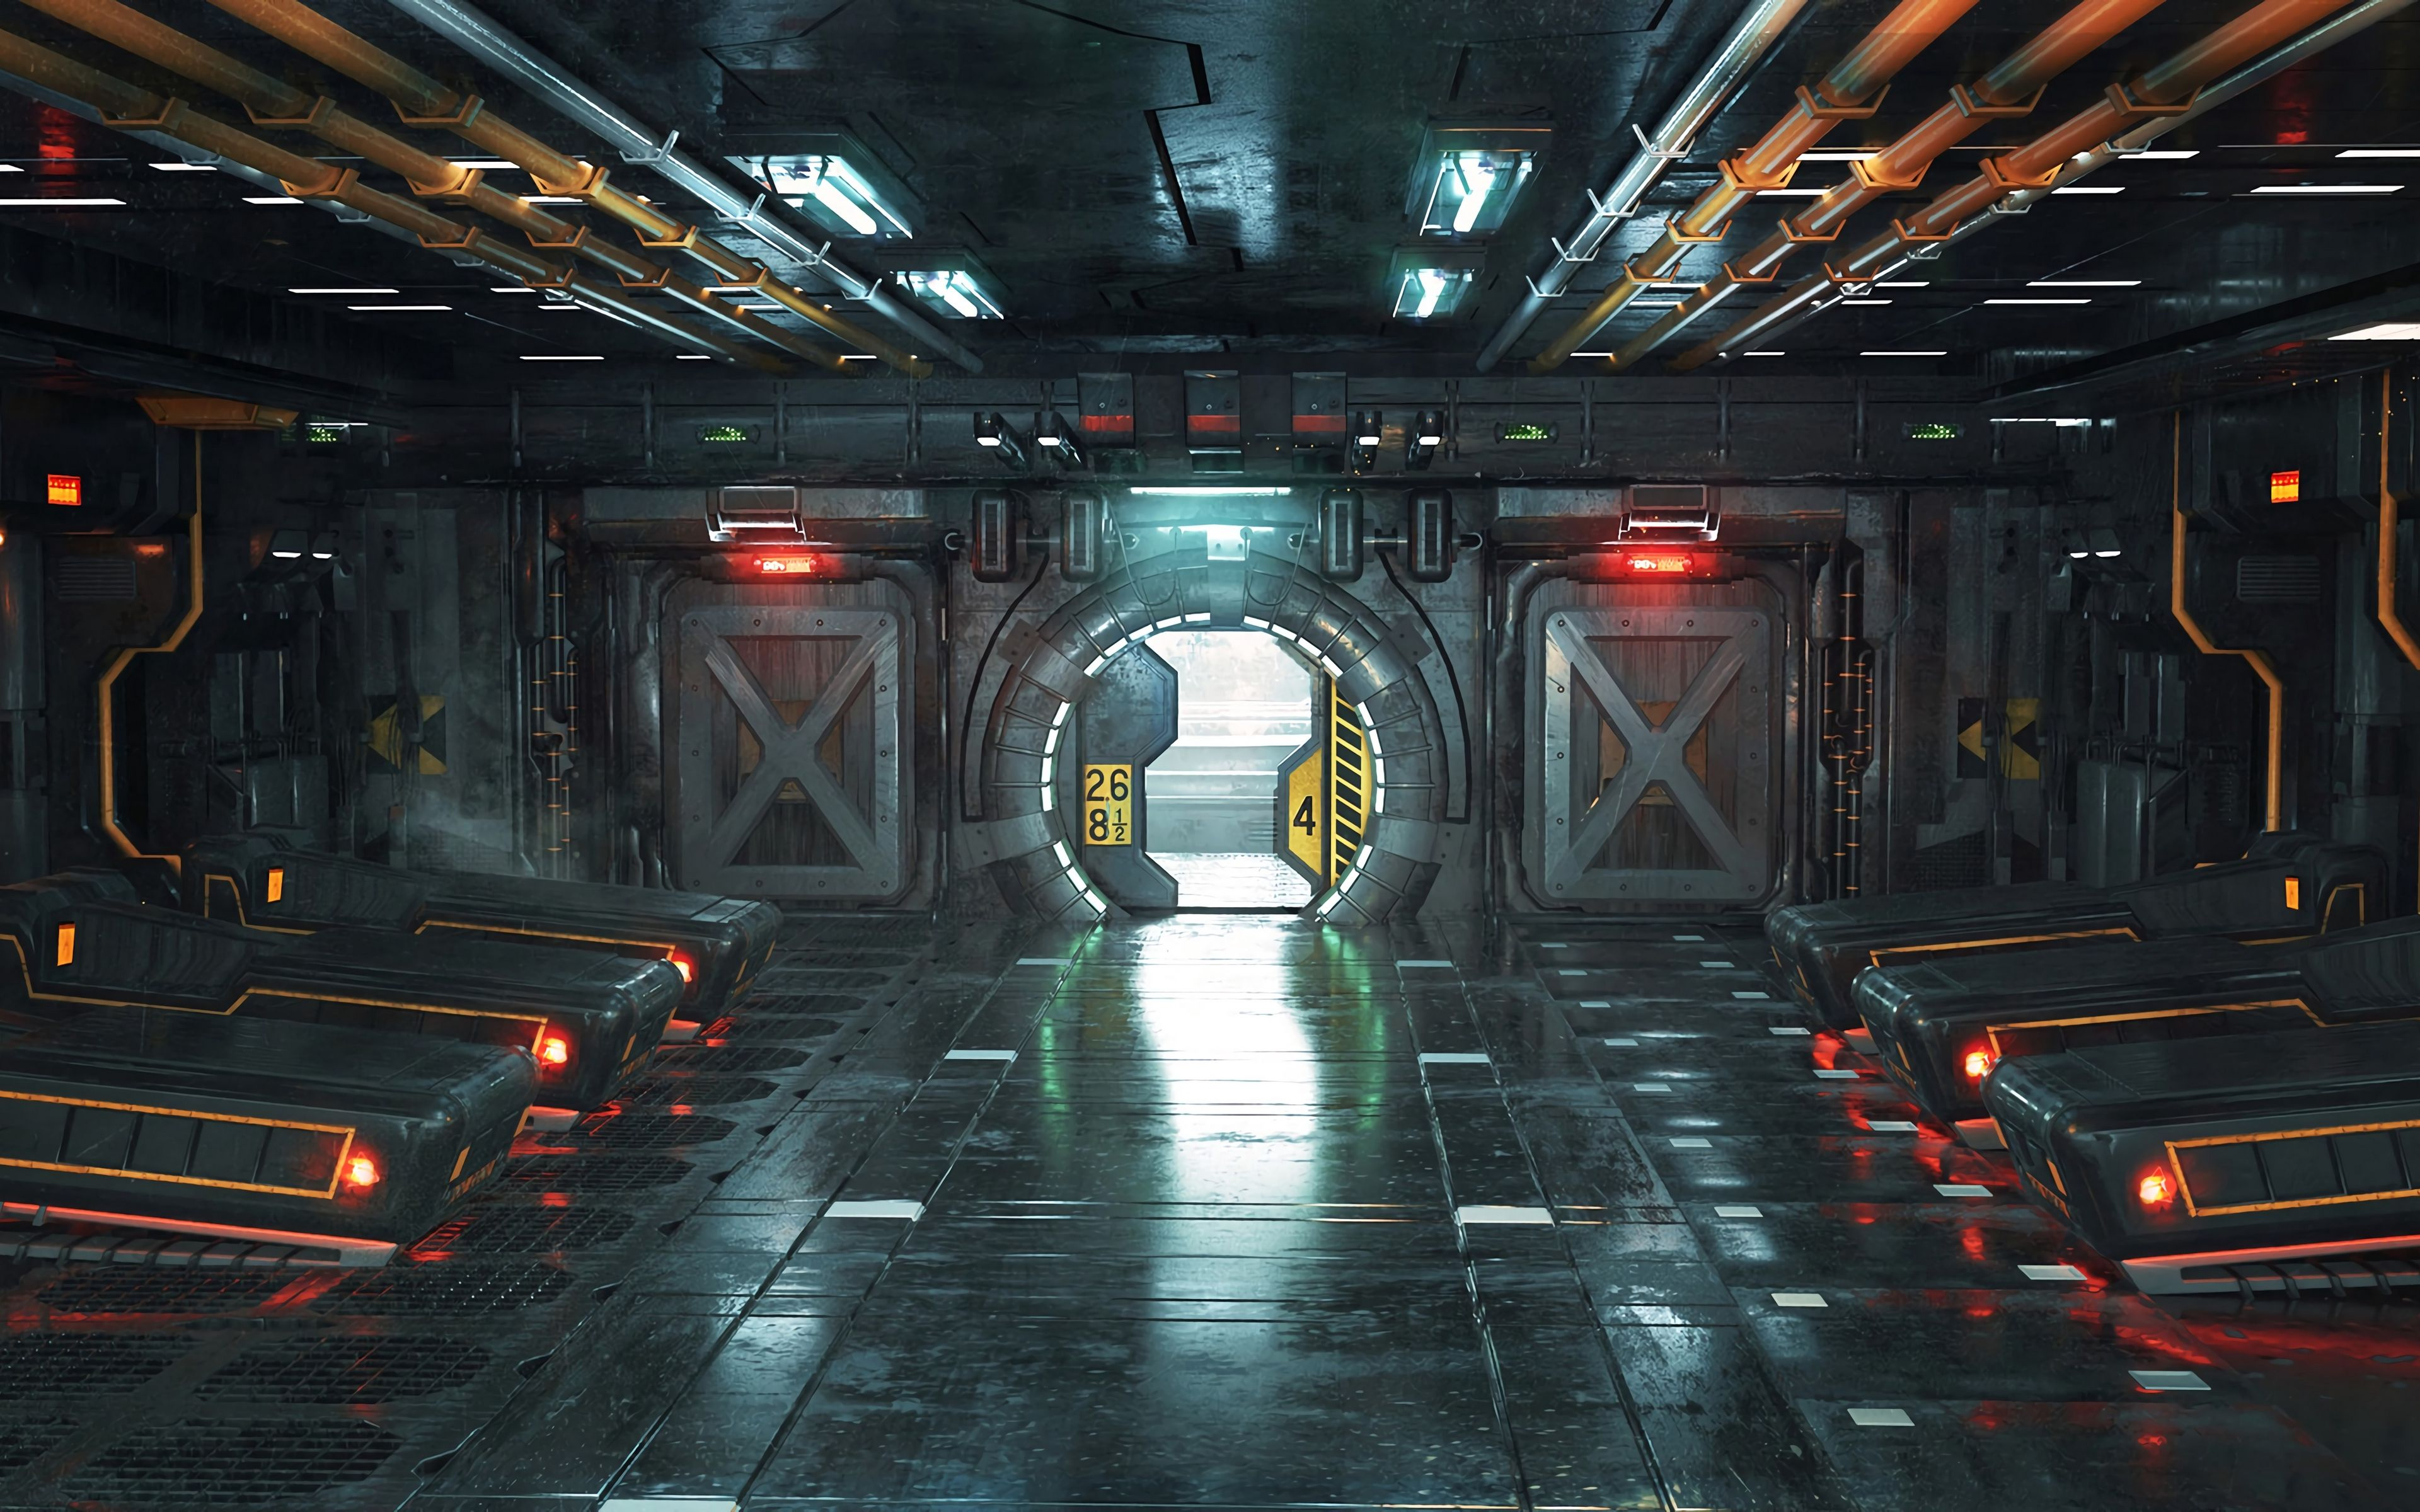 Sci-Fi Art Wallpapers - Top Free Sci-Fi Art Backgrounds ...